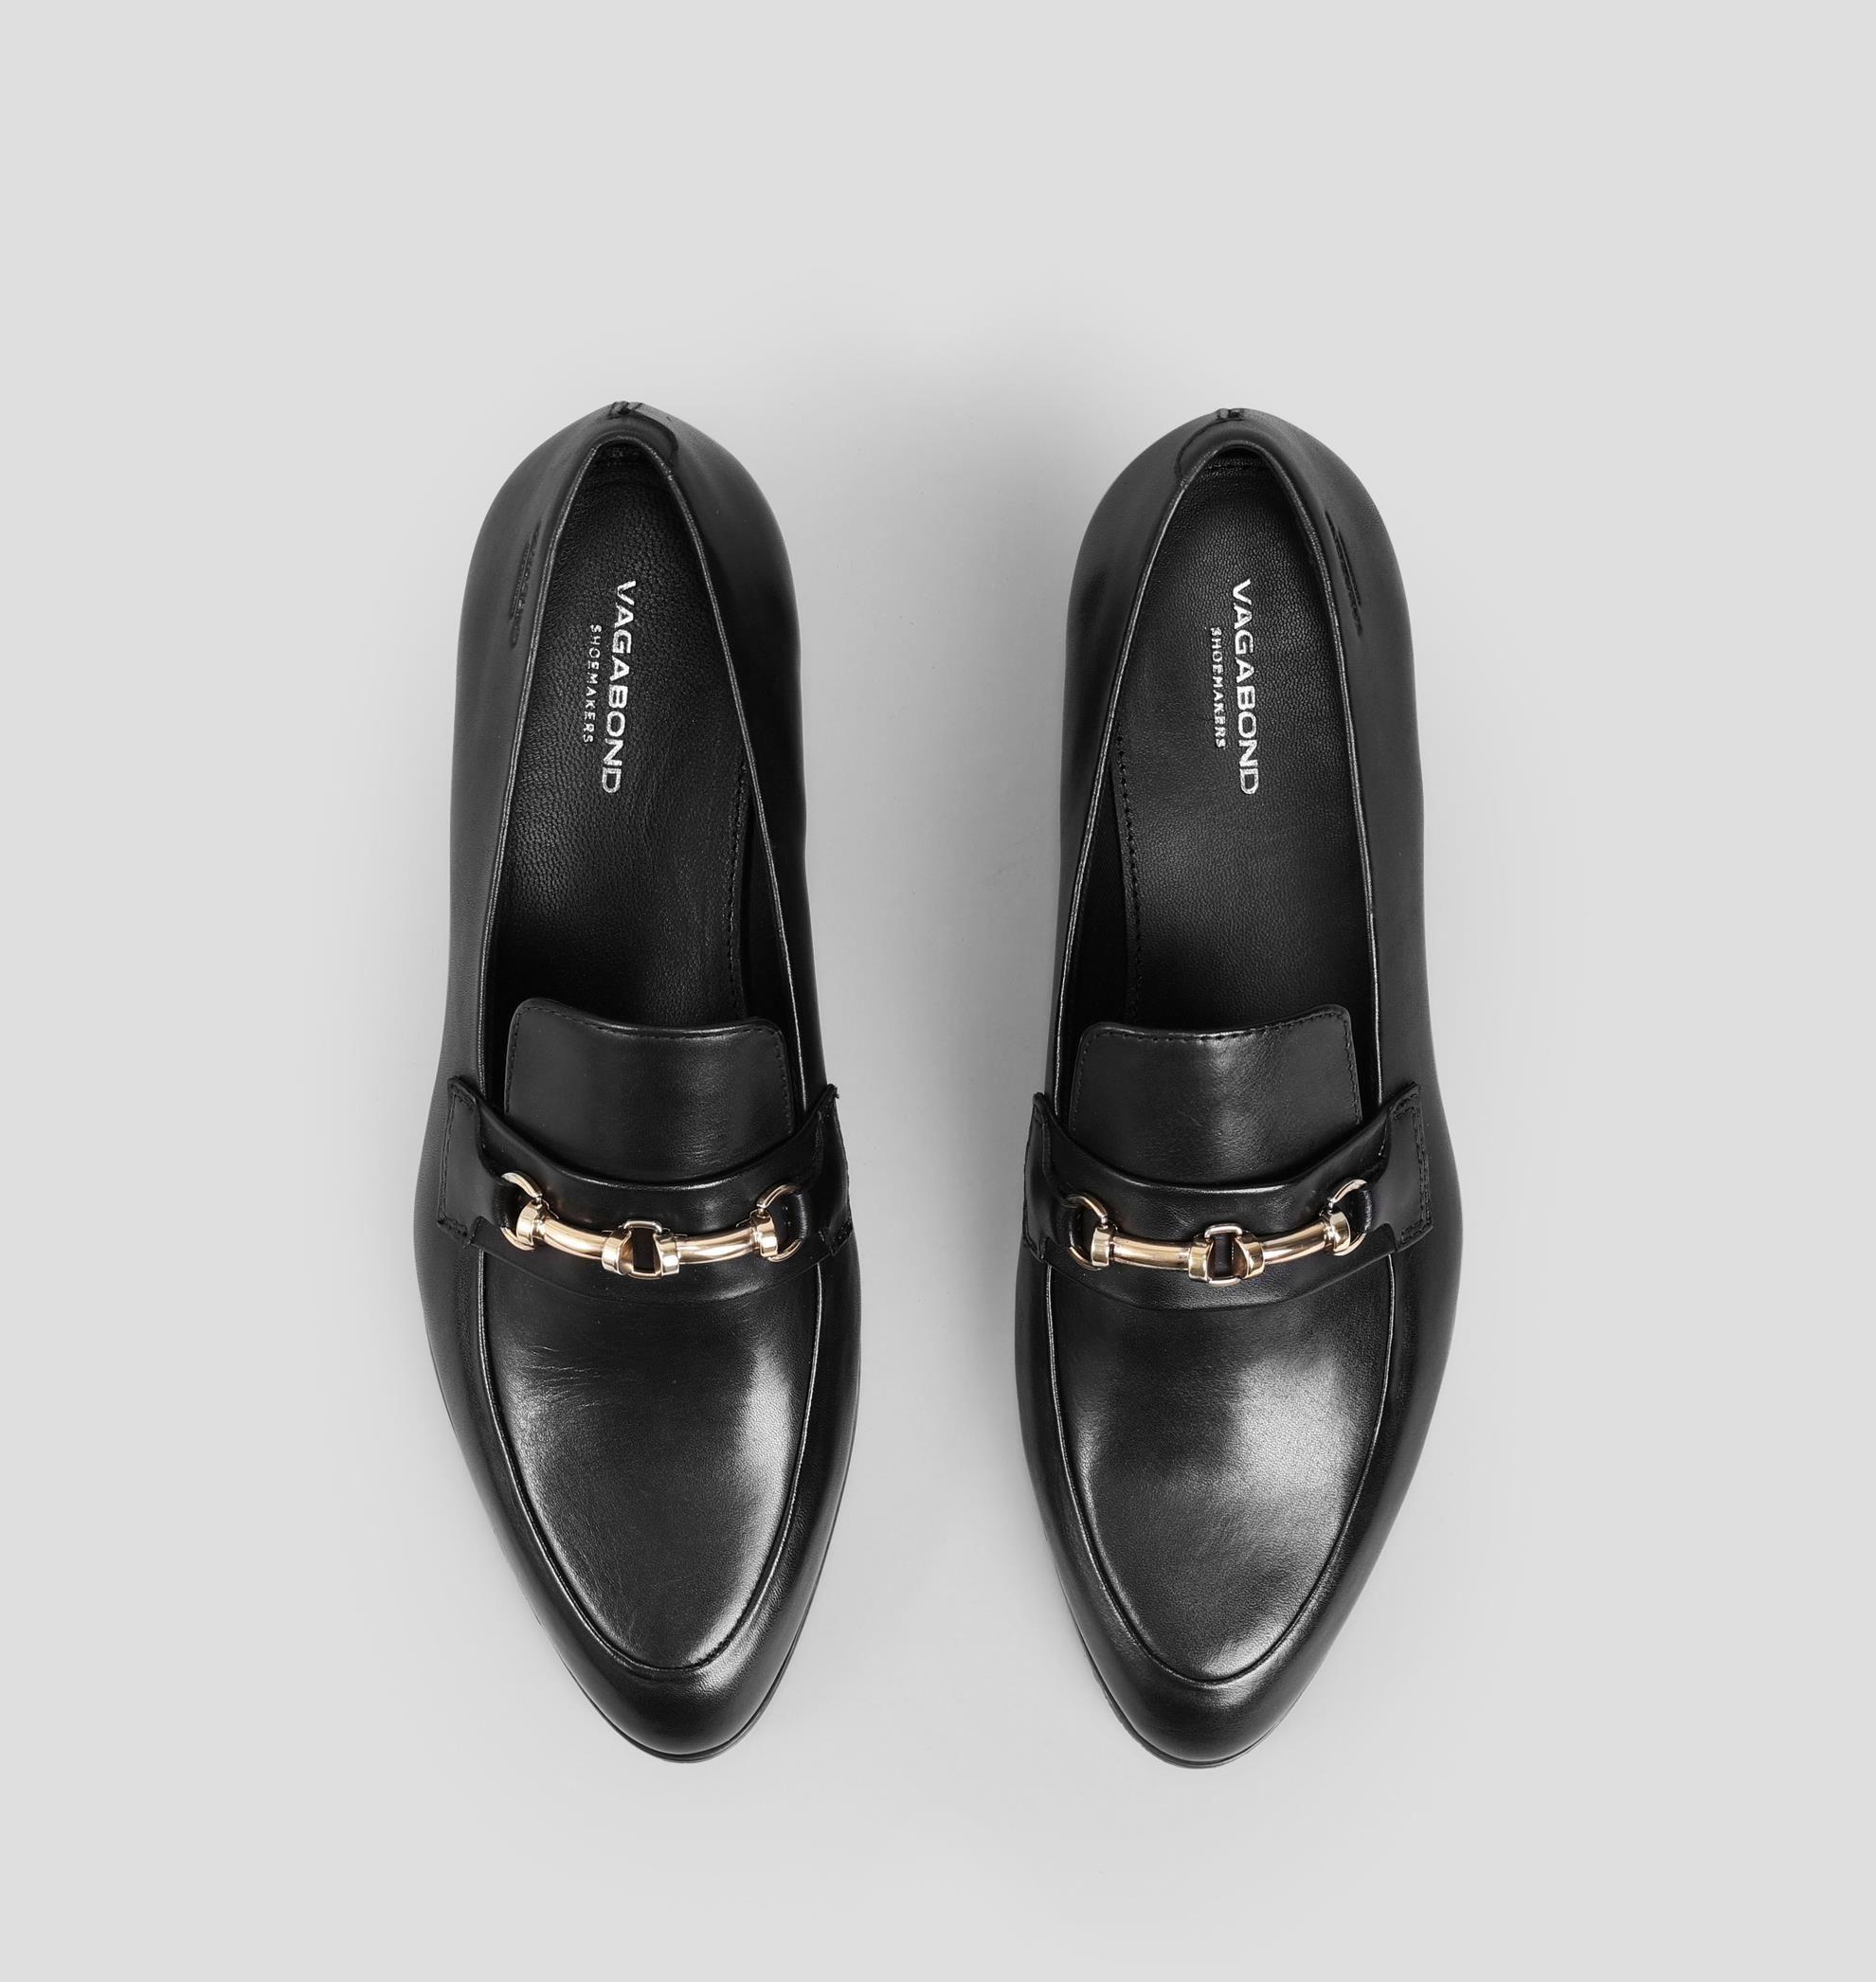 Frances Black Leather Shoes Black Leather Loafers